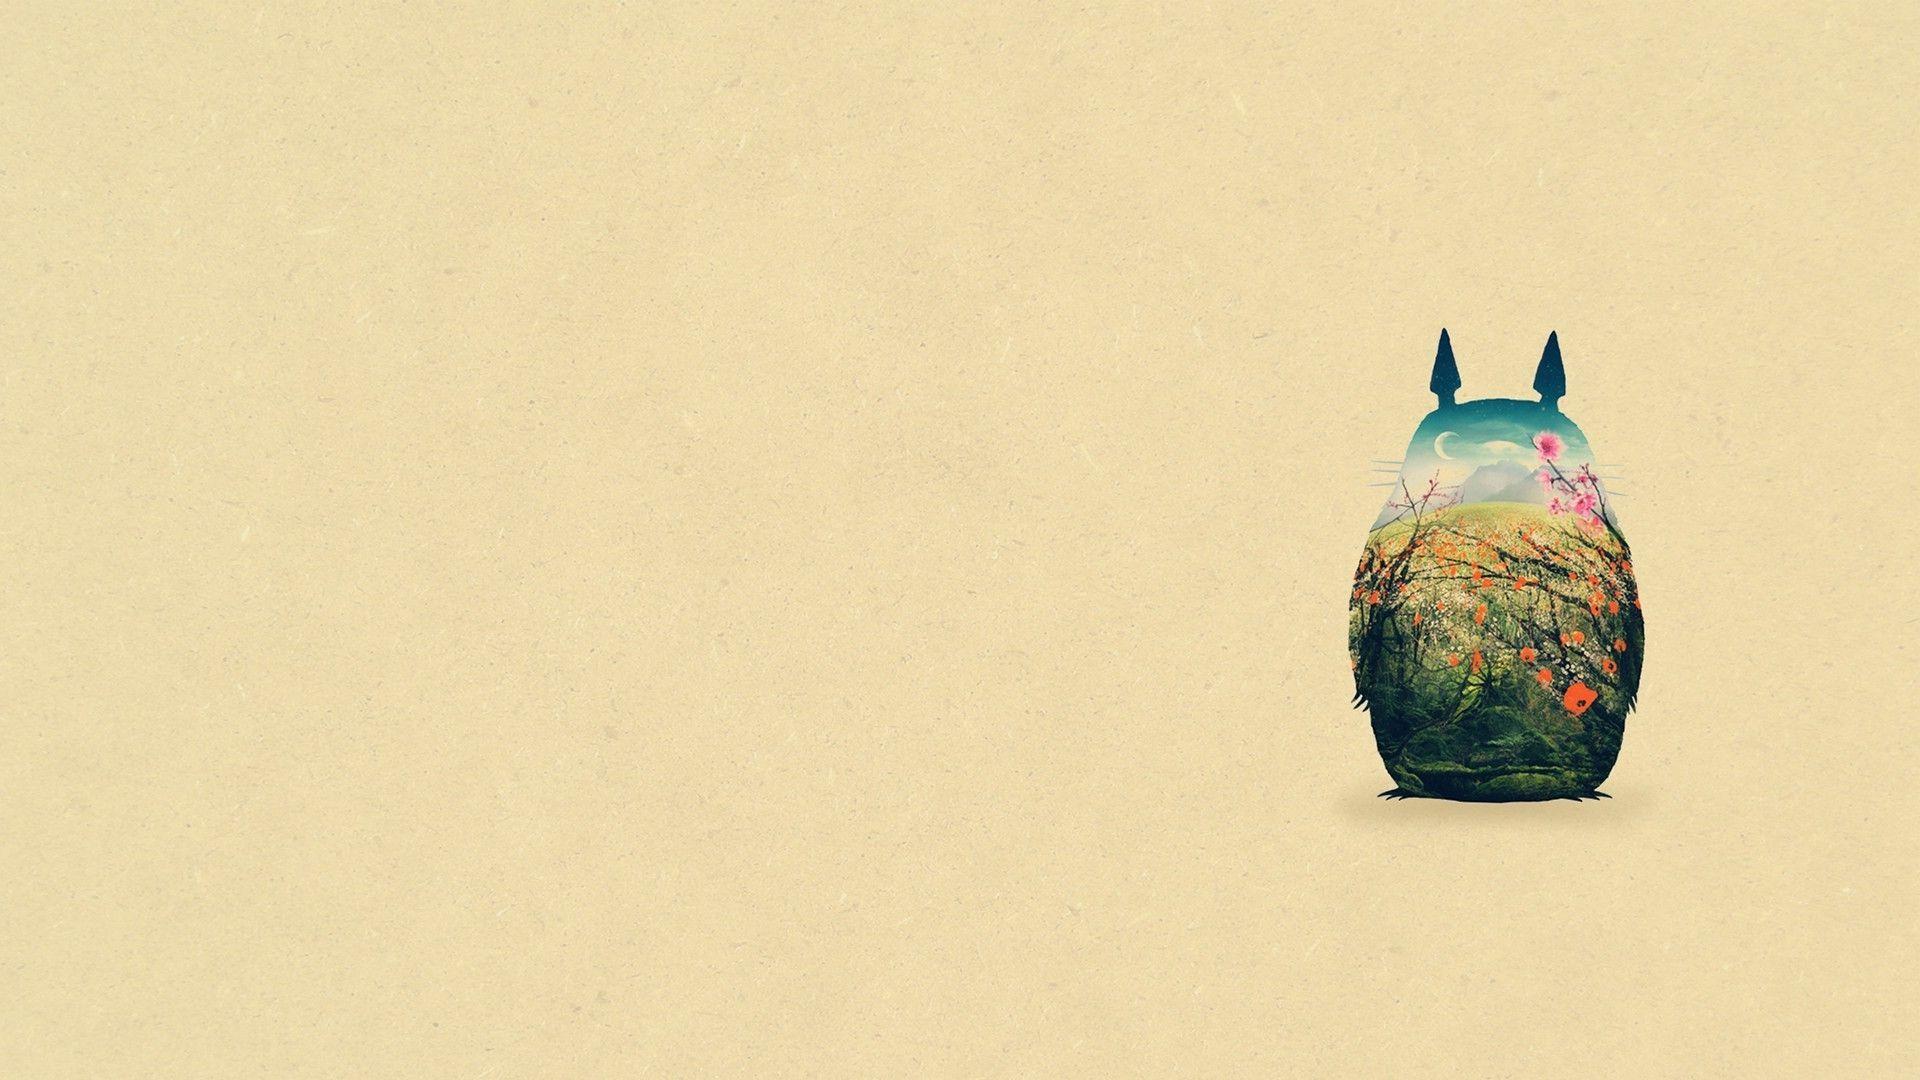 My Neighbor Totoro Wallpaper Page 1920×1080 Totoro